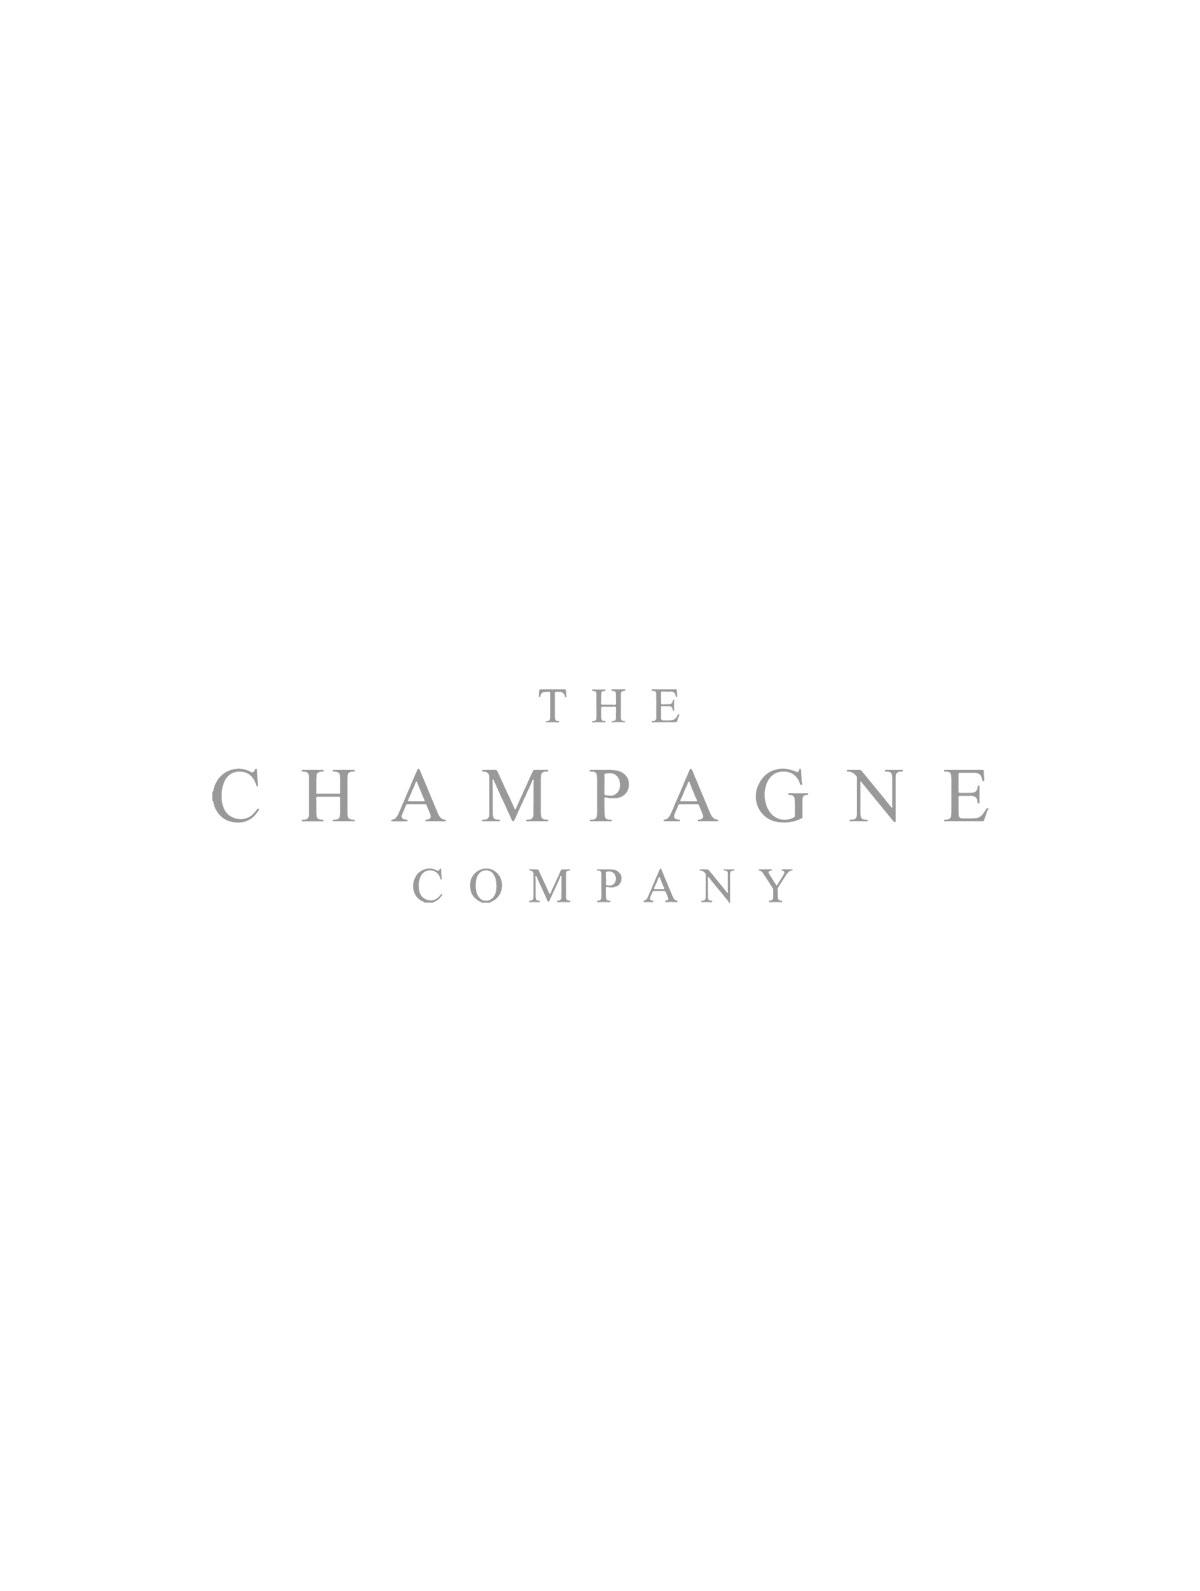 Boekenhoutskloof The Chocolate Block 2015 South Africa Wine 150cl